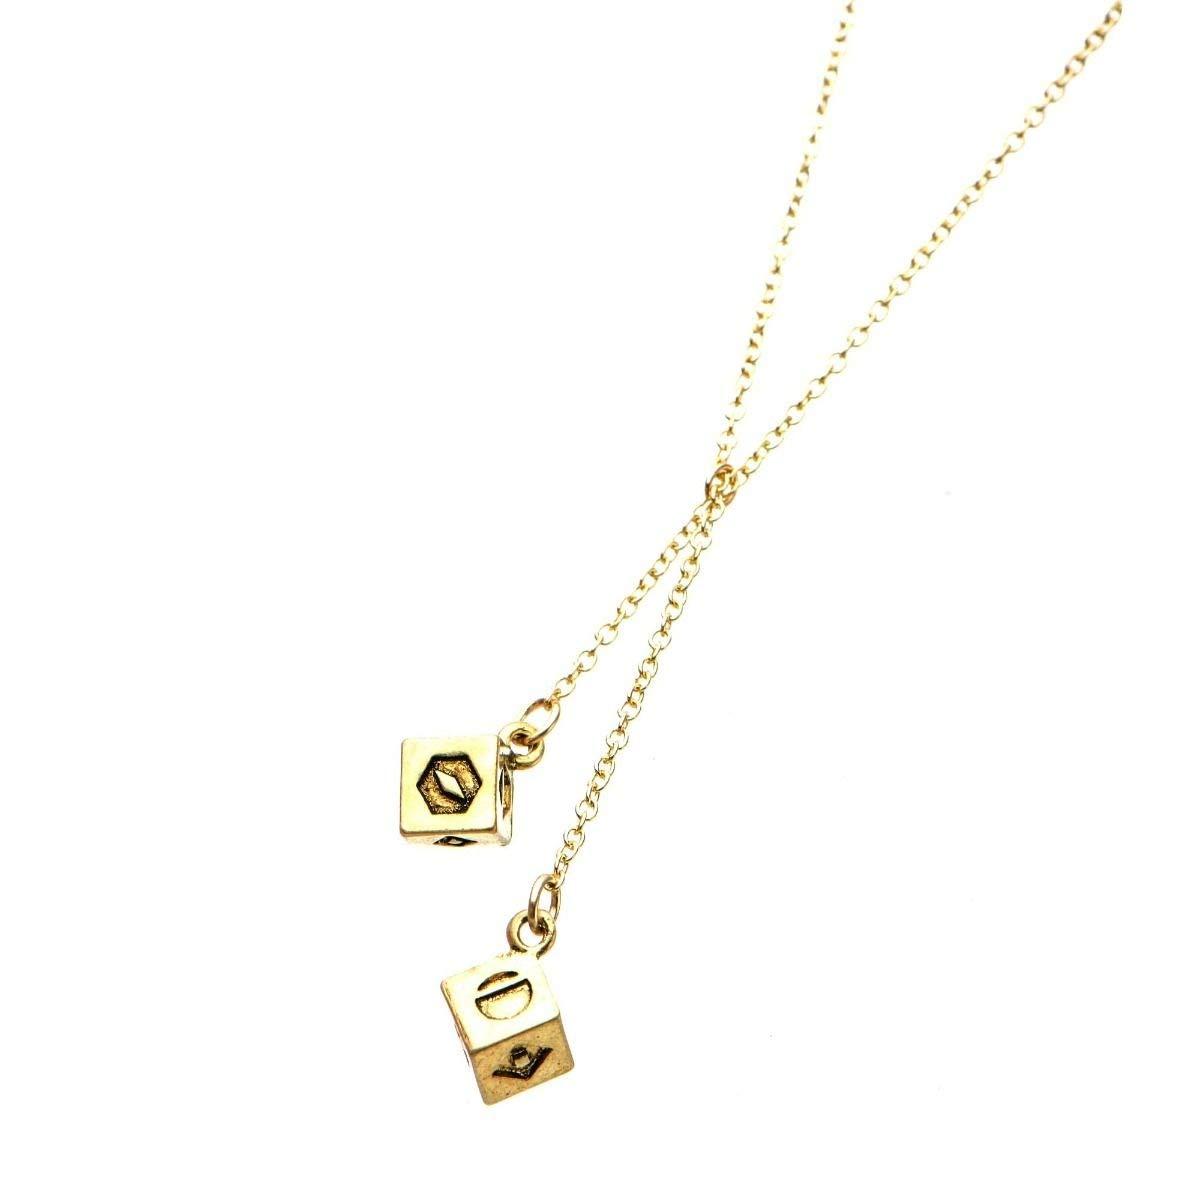 Star Wars 3D Golden Dice 316L Stainless Steel /& Base Metal Pendant Necklace